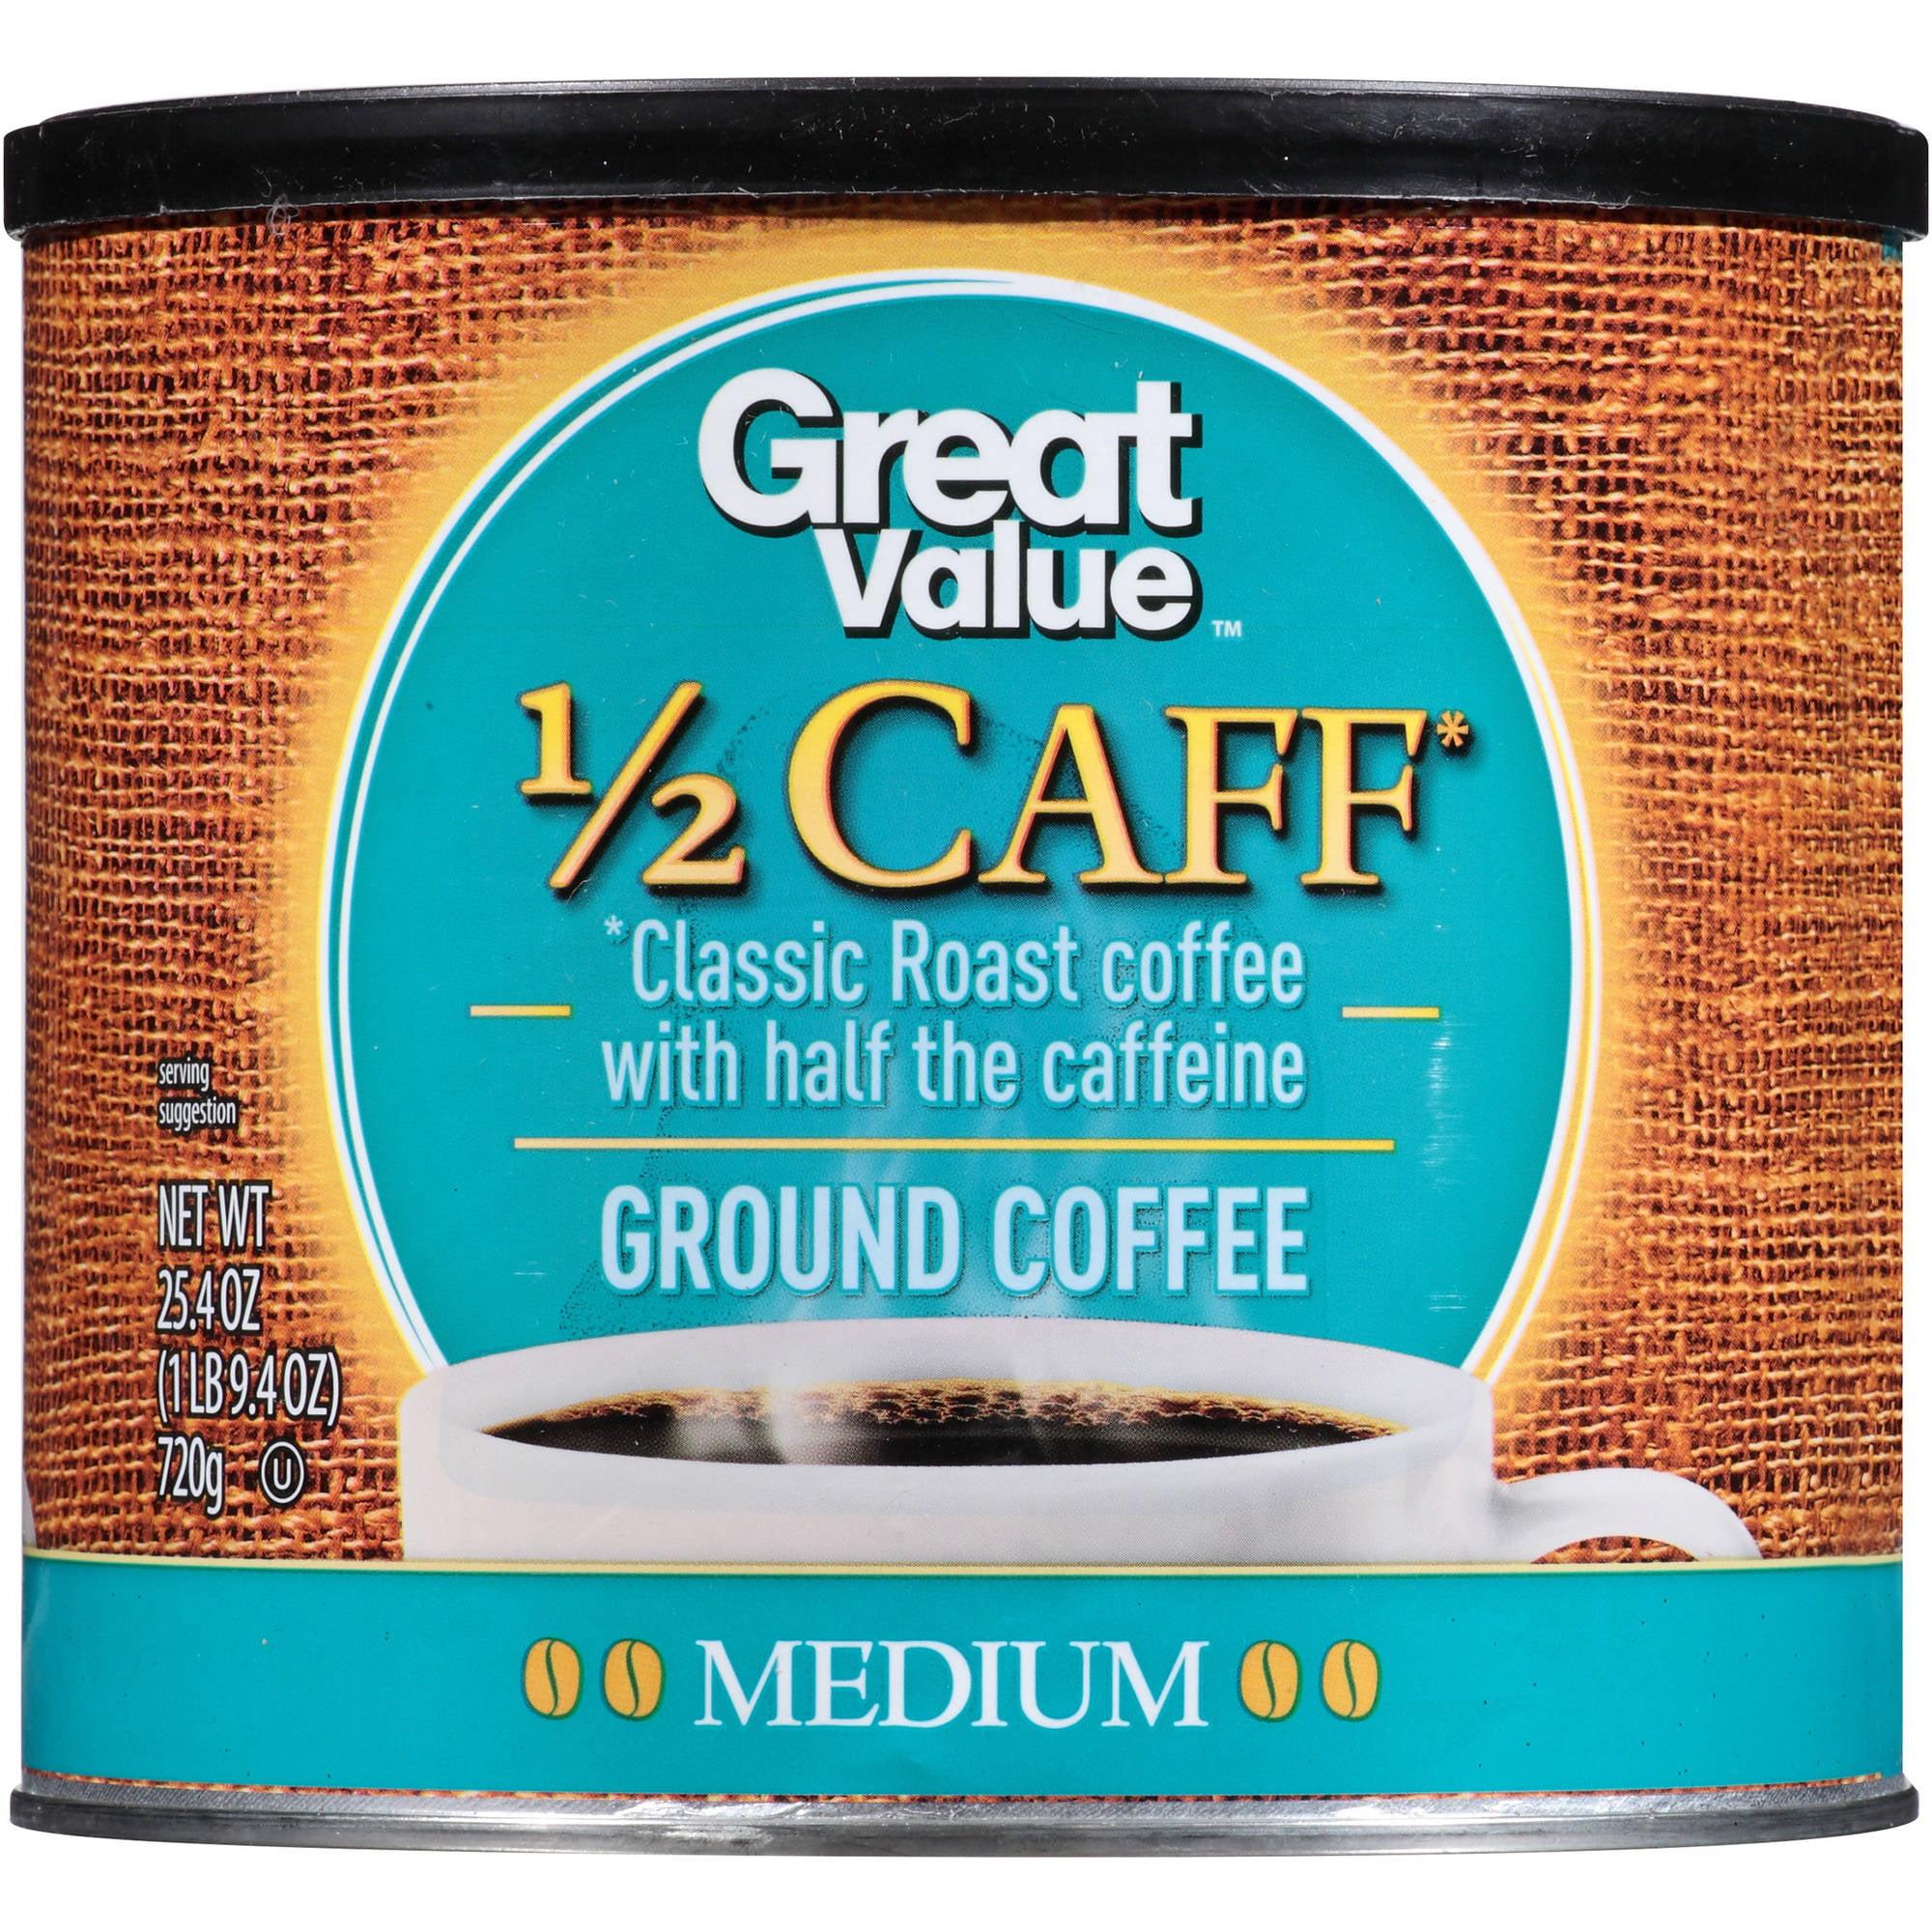 Great Value 1/2 Caff Classic Roast Medium Ground Coffee, 25.4 oz